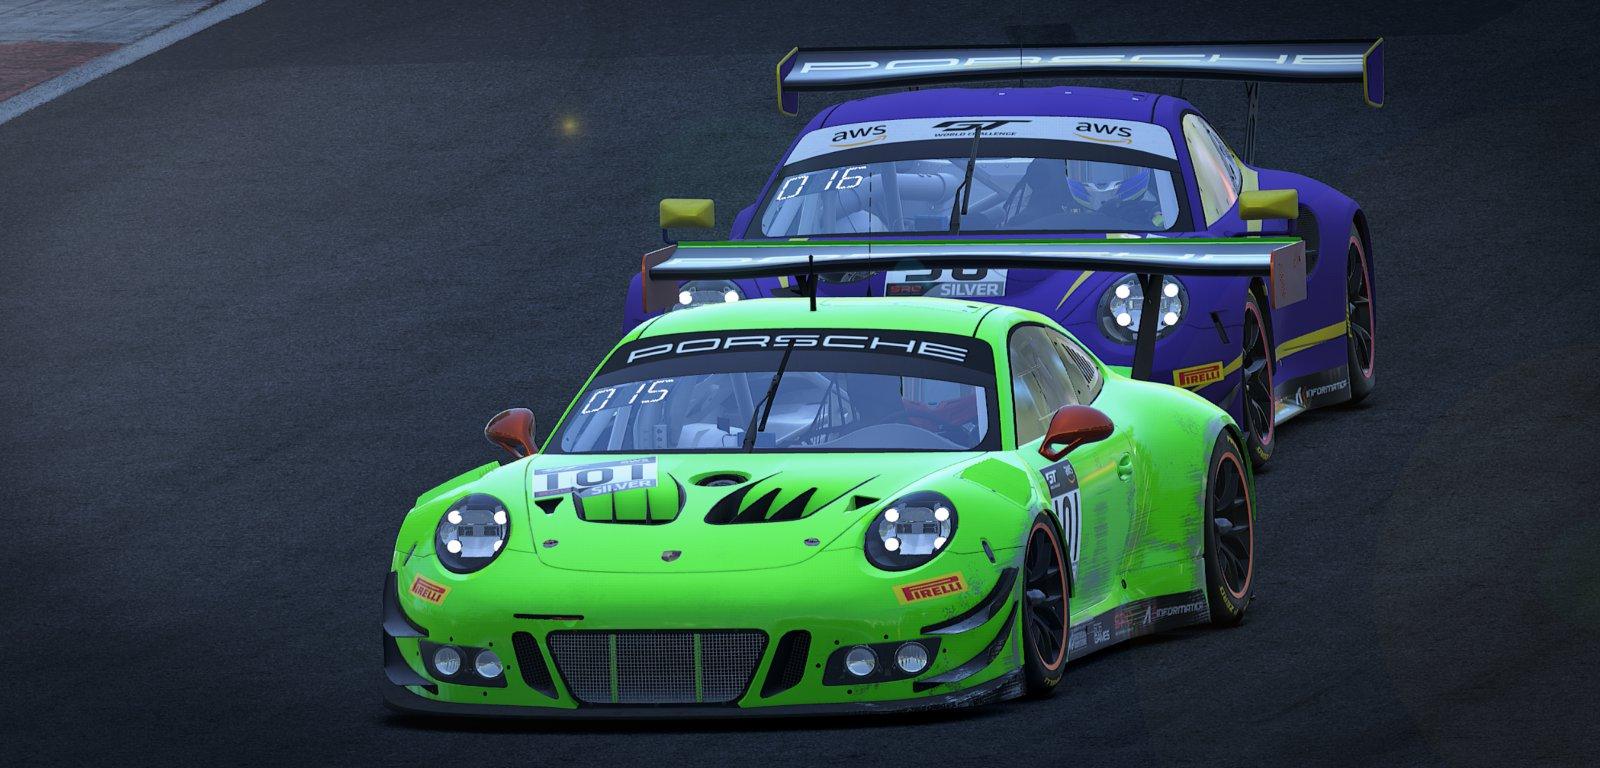 Assetto Corsa Competizione Screenshot 2020.05.20 - 00.07.45.43.jpg